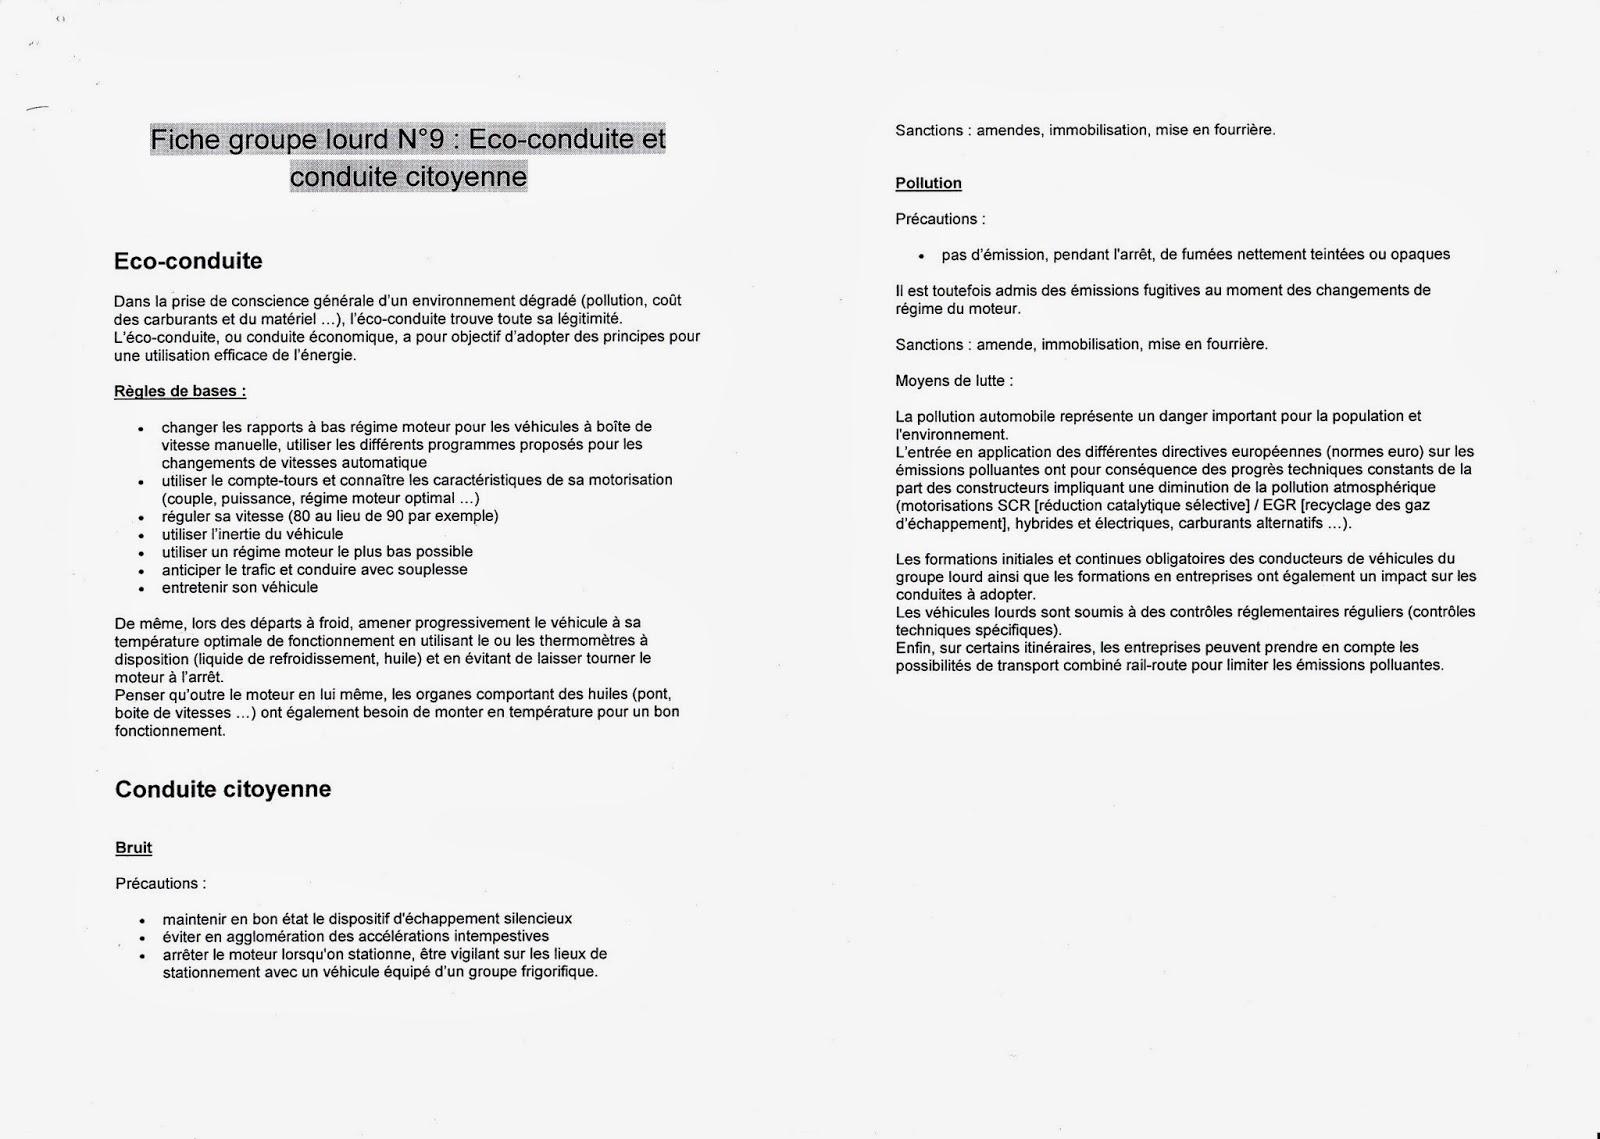 slatni ghifari interrogations orales 2013 des permis poids lourd et be. Black Bedroom Furniture Sets. Home Design Ideas